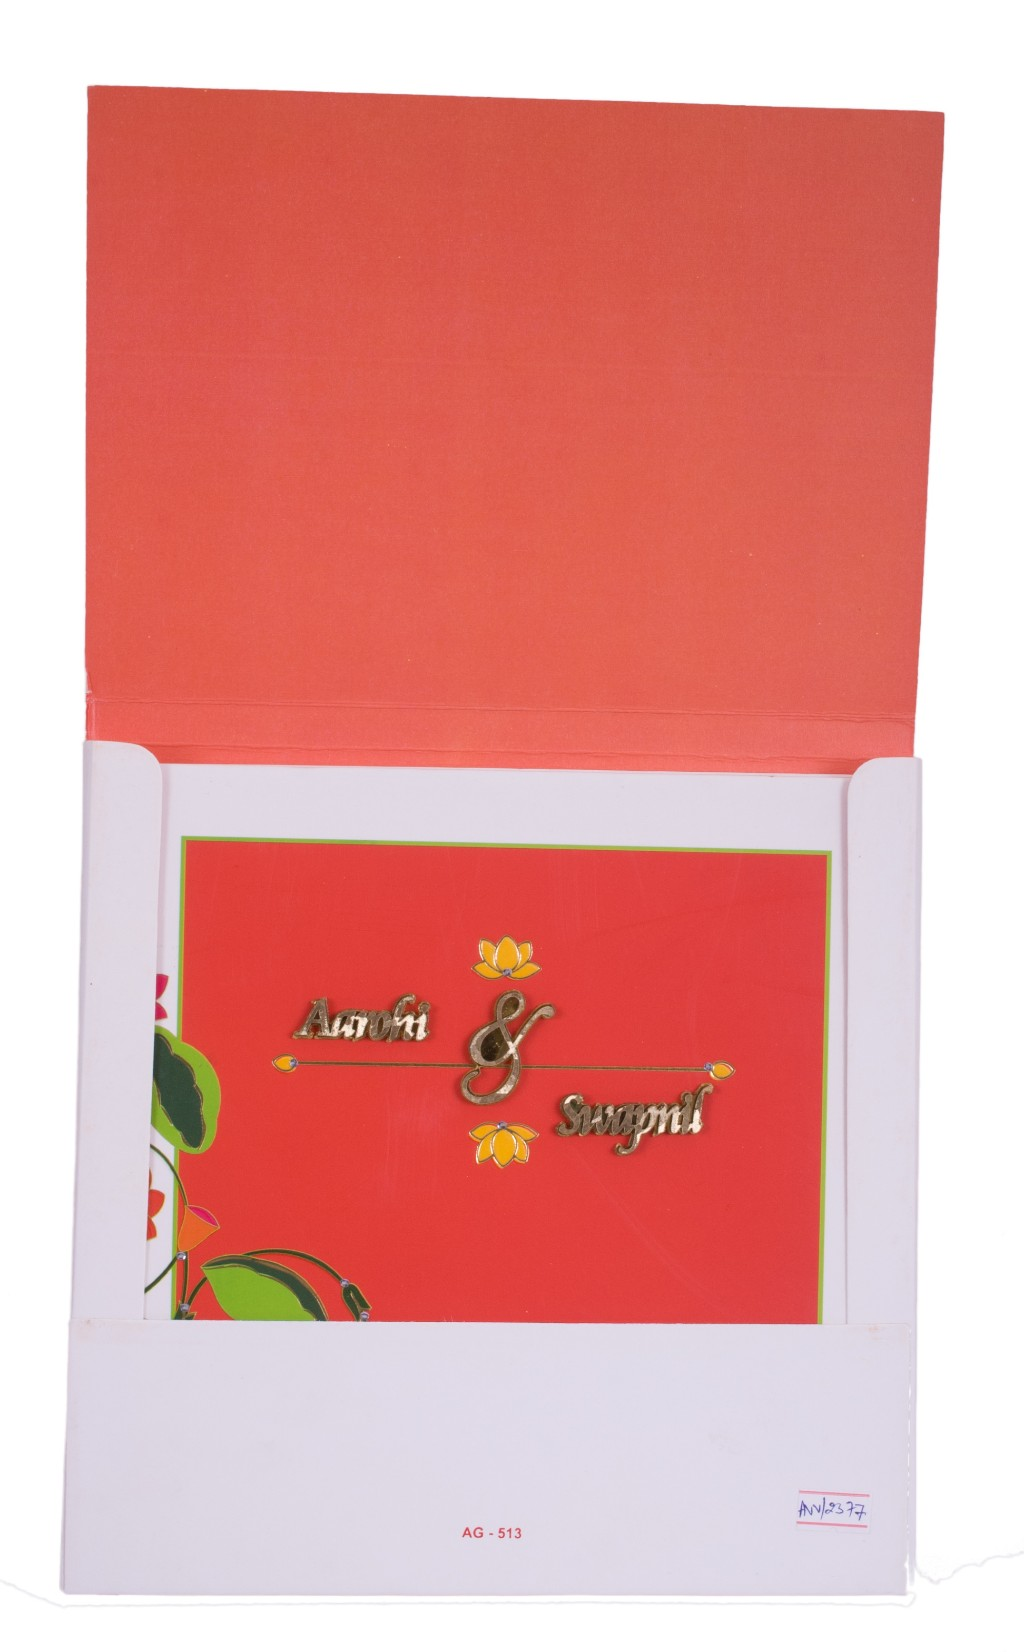 Multicolored-floral wedding invitation card